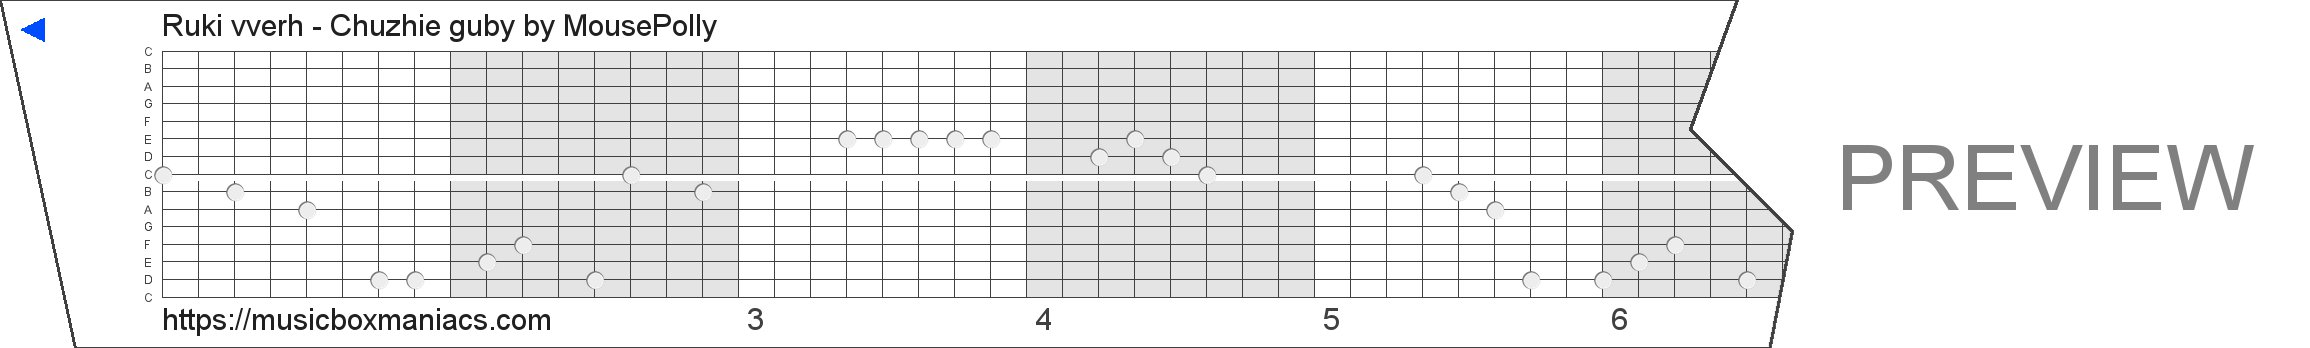 Ruki vverh - Chuzhie guby 15 note music box paper strip